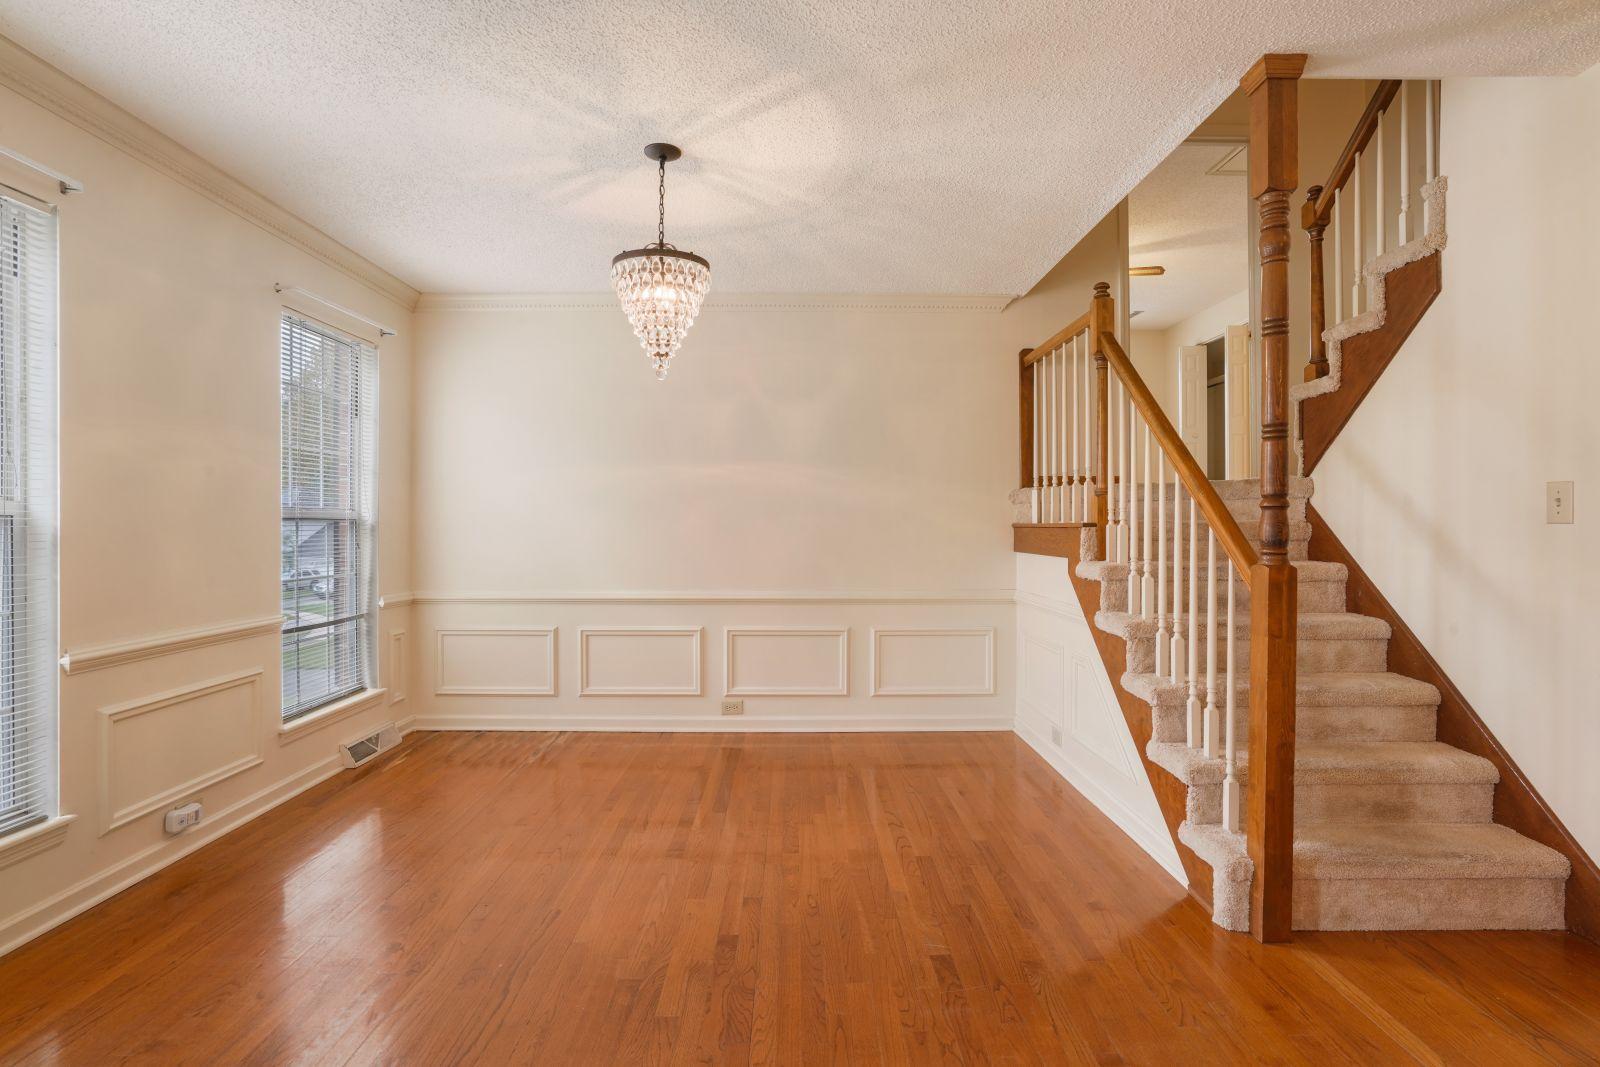 Crowfield Plantation Homes For Sale - 161 Belleplaine, Goose Creek, SC - 35